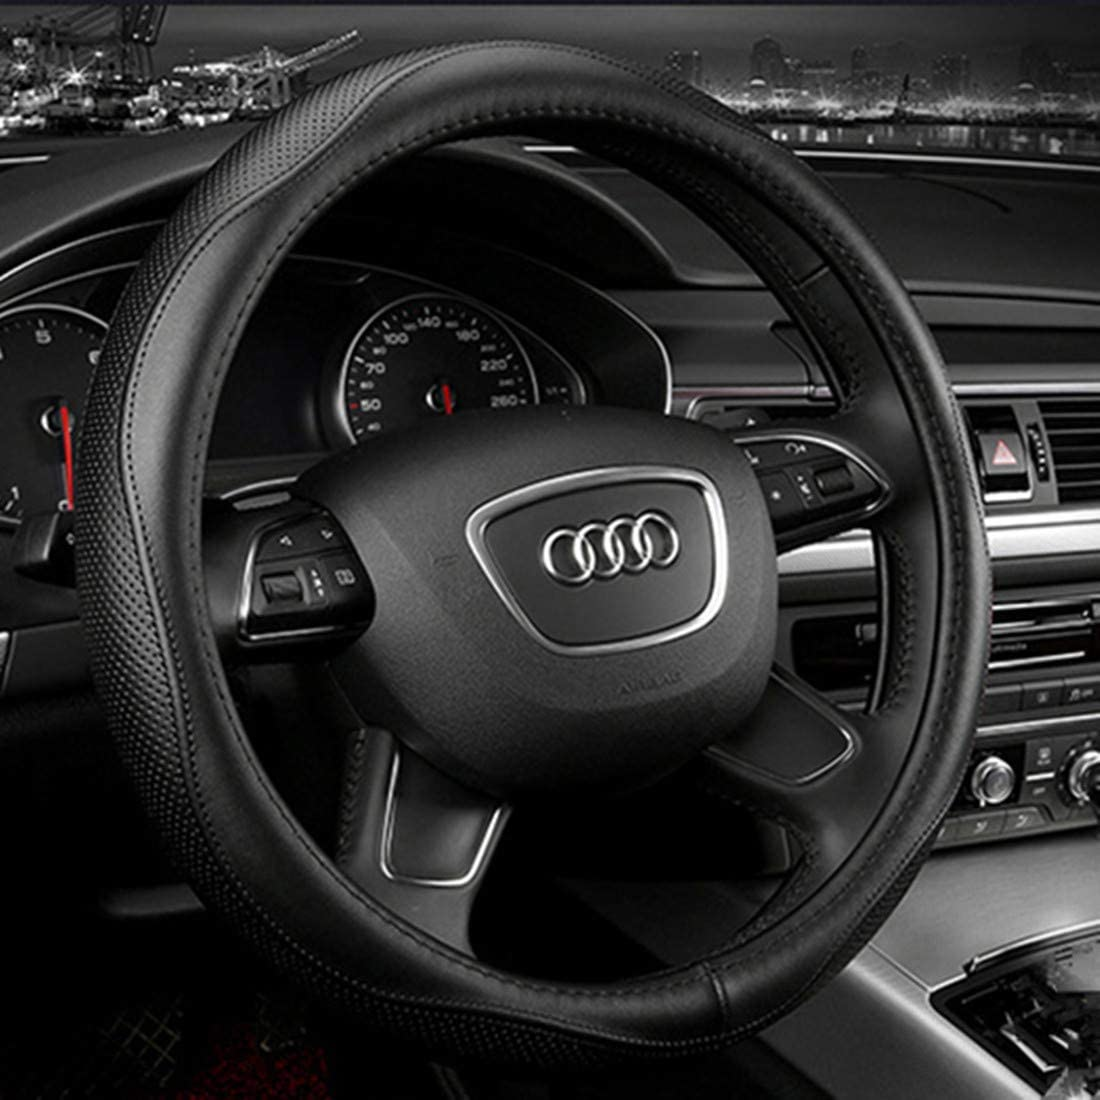 KAFEEK Leather Steering Wheel Cover Black Square Universal 15 inch Anti-Slip